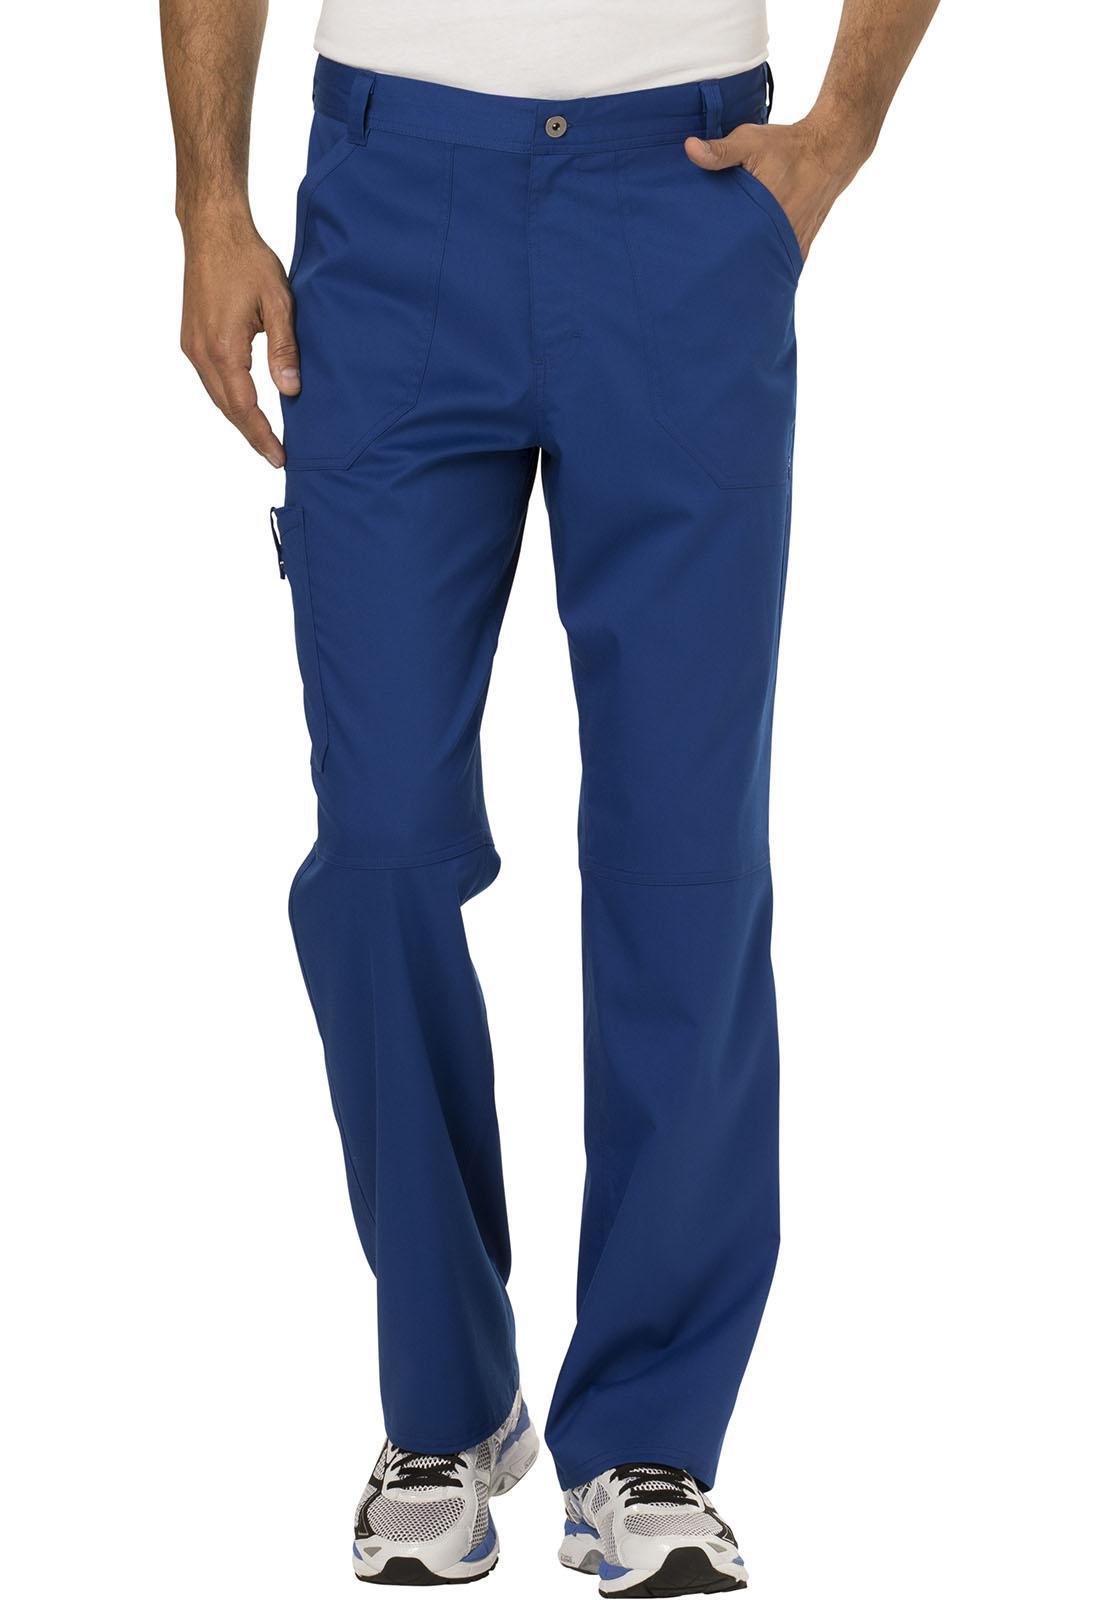 de3e4808055 WW Revolution Men's Fly Front Pant in Galaxy Blue WW140-GAB from ...